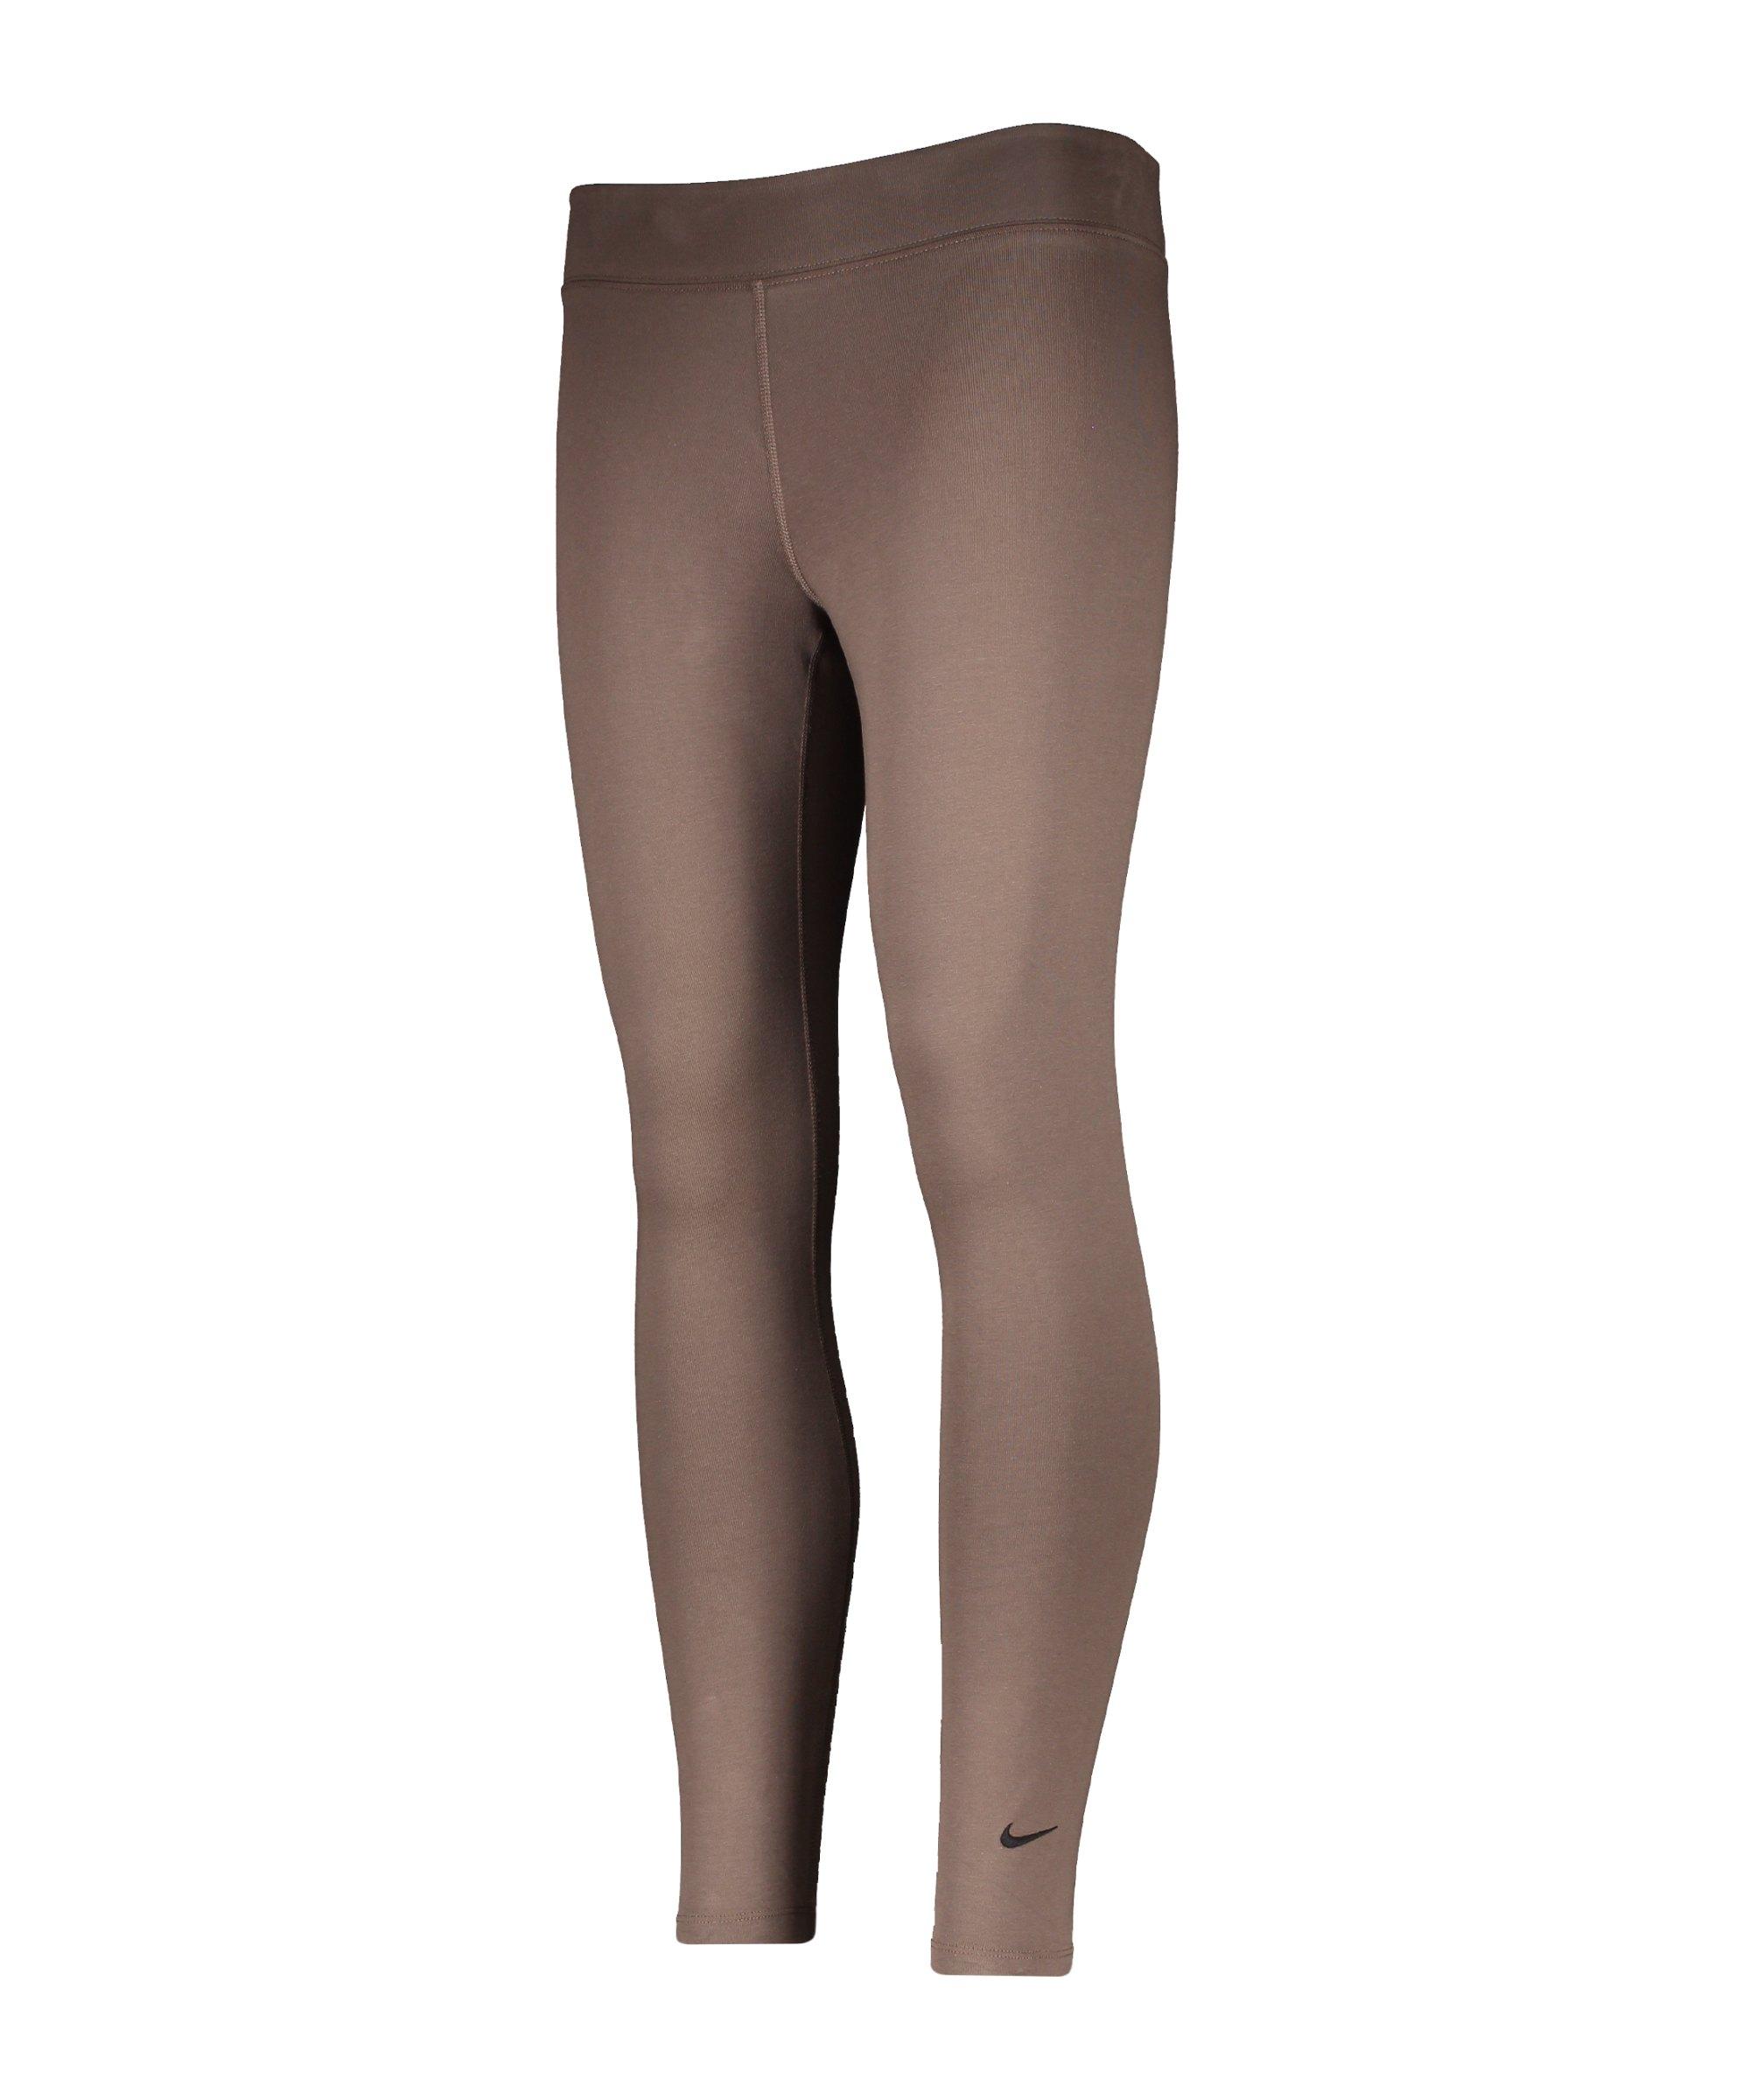 Nike Essentials 7/8 Leggings Damen Grau F004 - grau